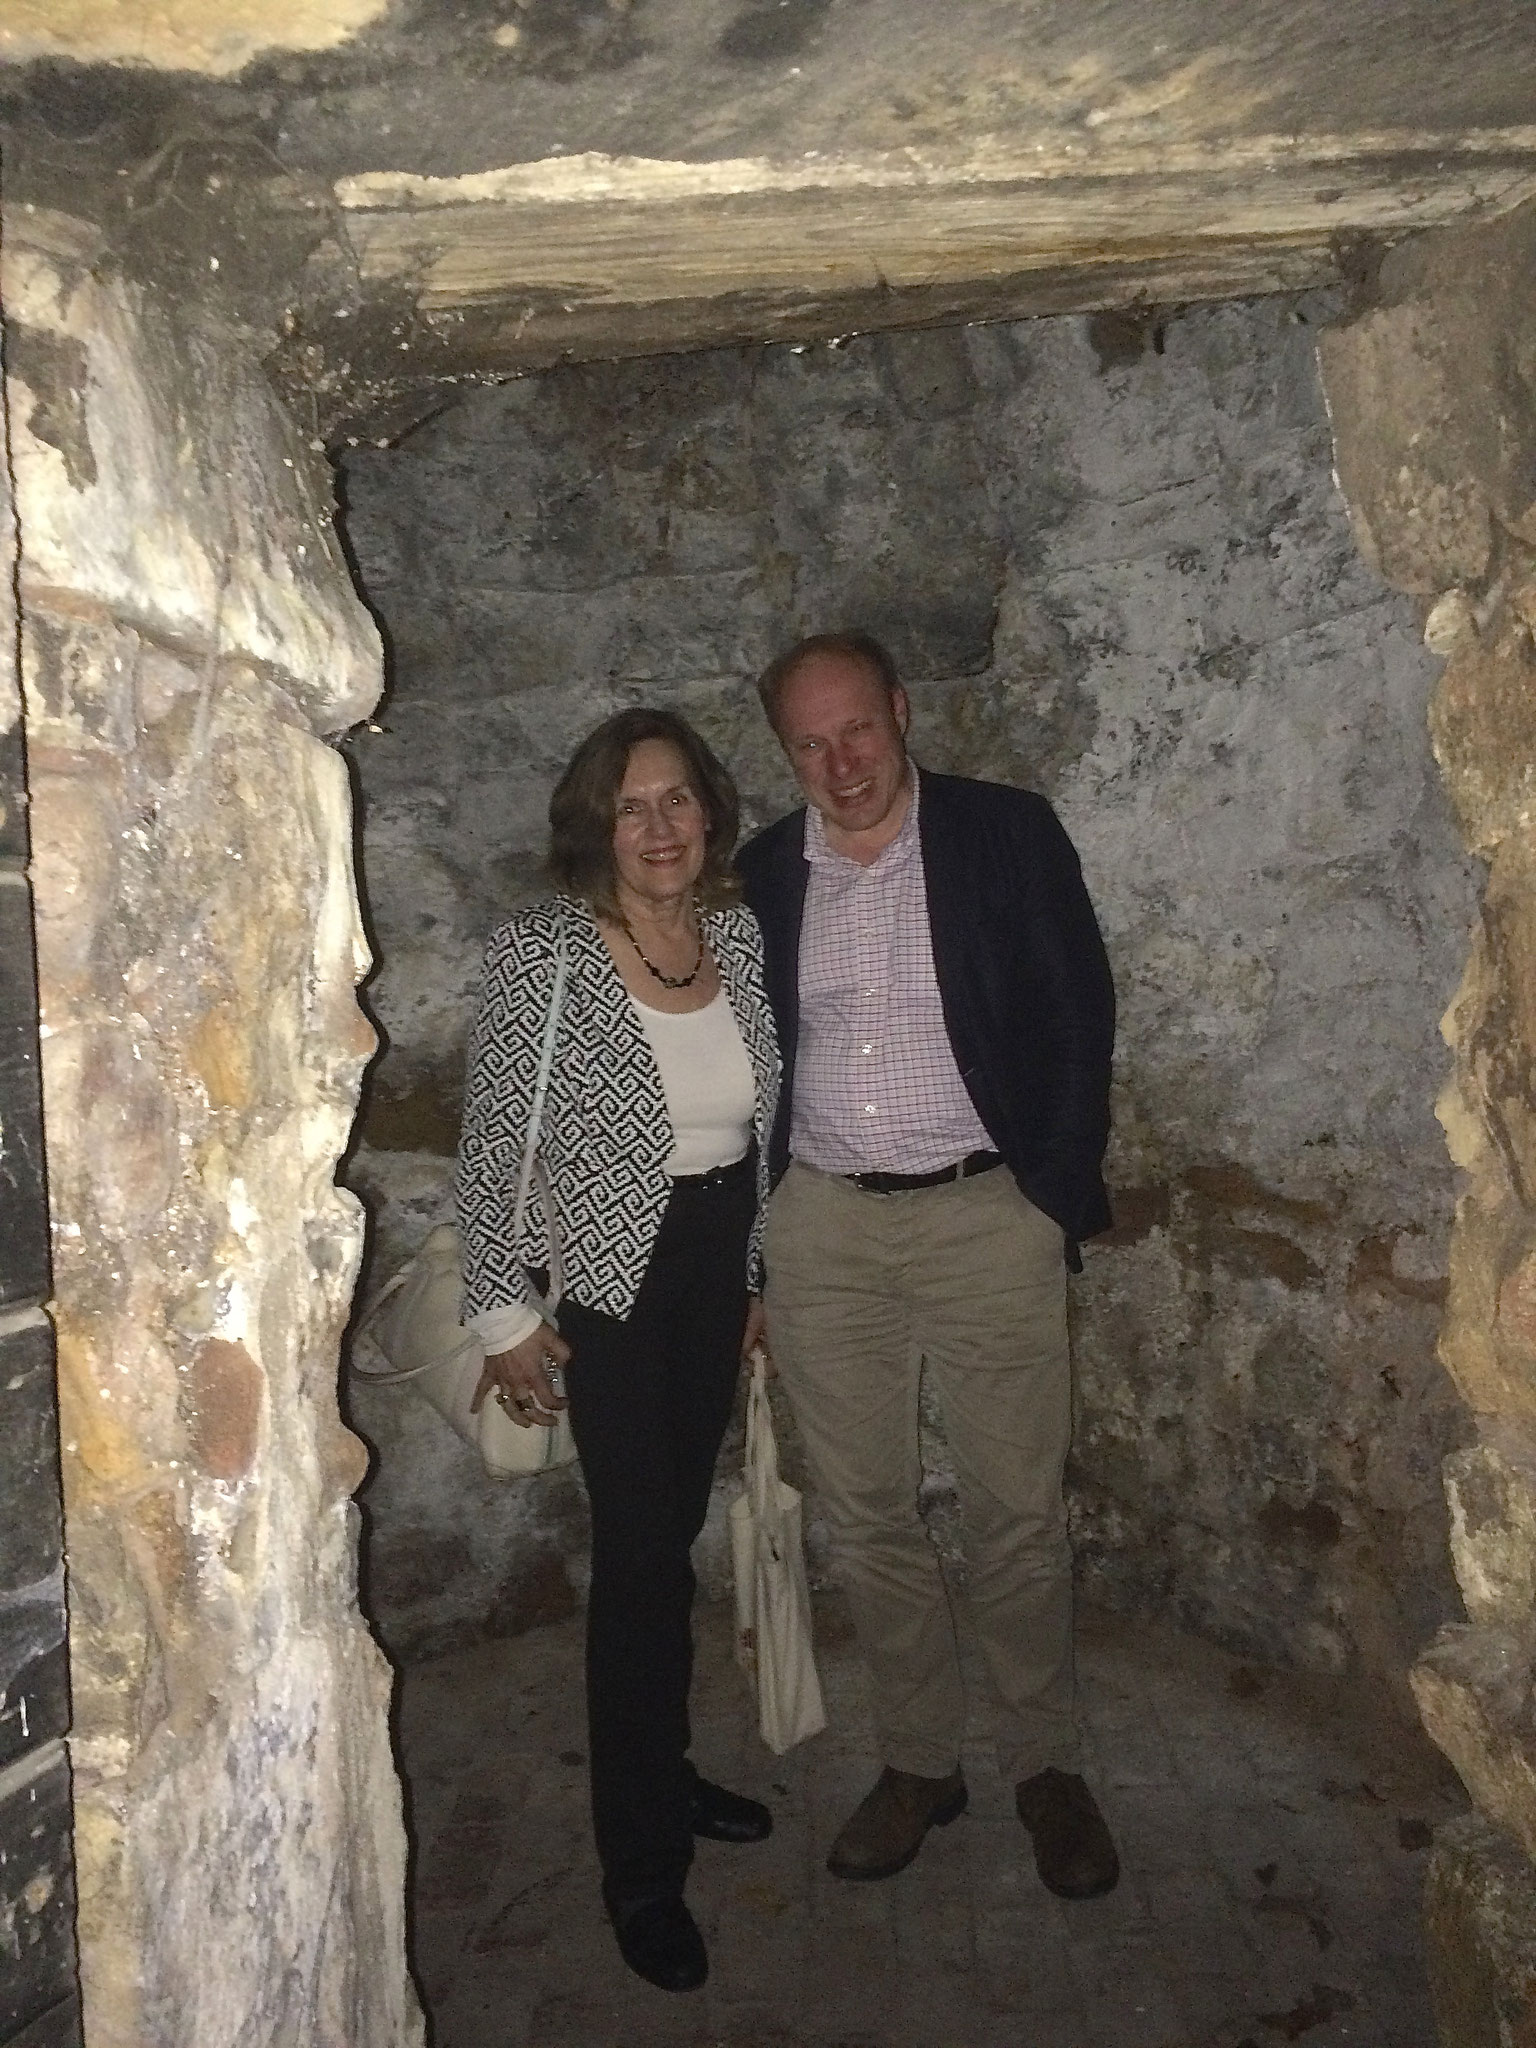 Lorraine Gudas and John Schwabe (Univ. of Leicester)